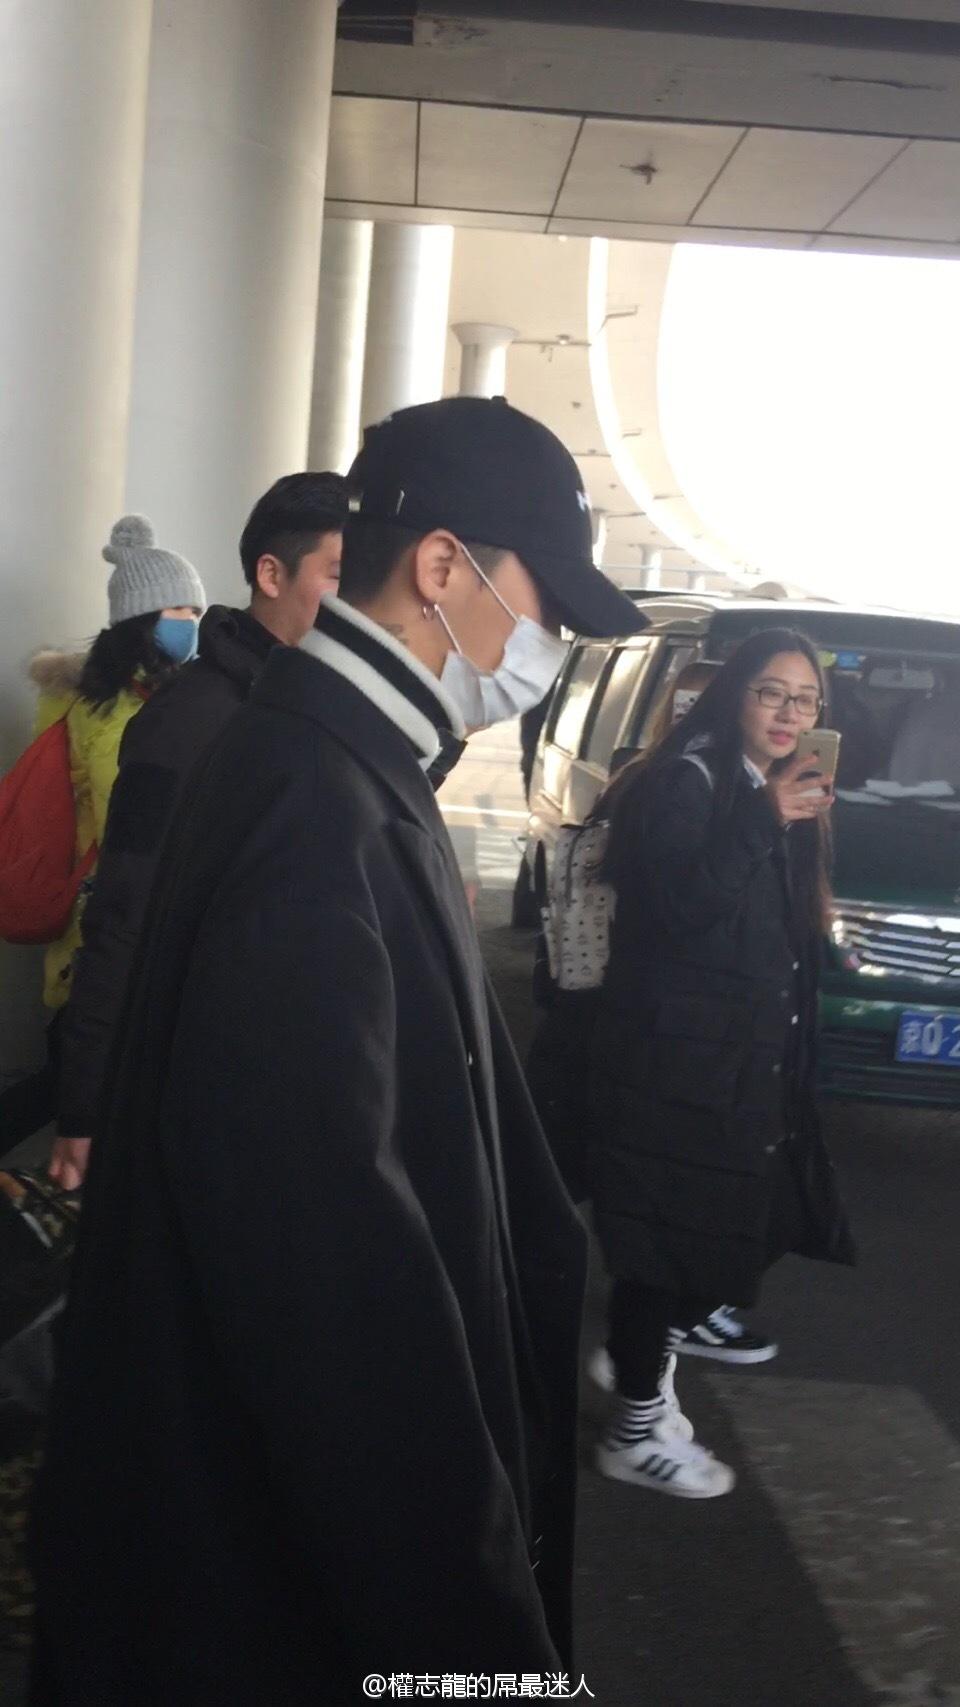 BIGBANG - Beijing Airport - 31dec2015 - 2261401031 - 07